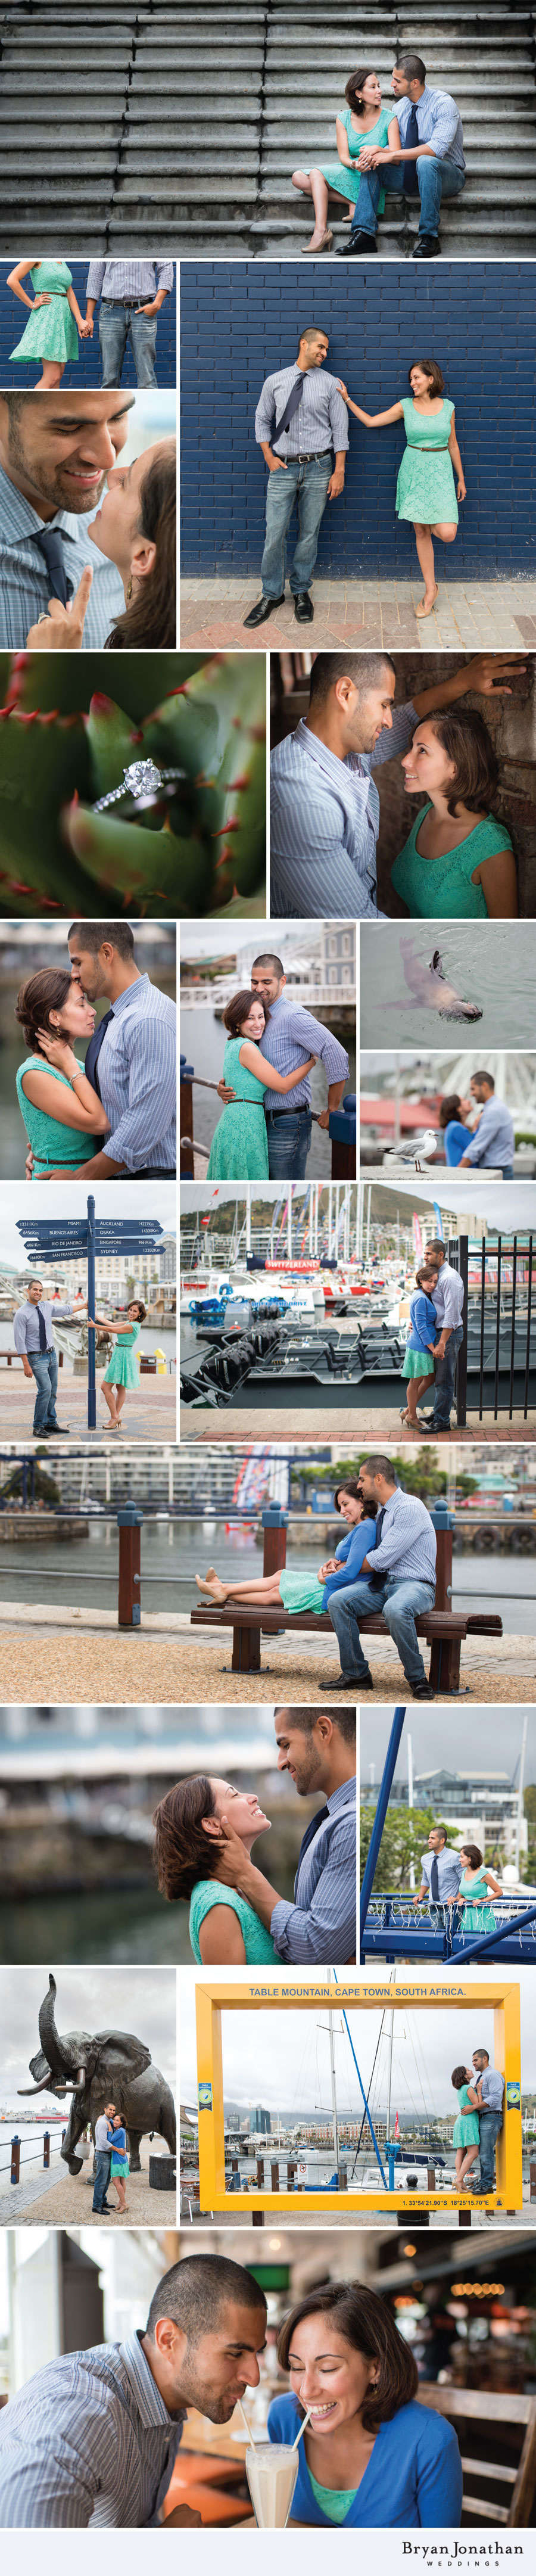 destination-wedding-photographer-bryan-jonathan-weddings-cape-town-south-africa